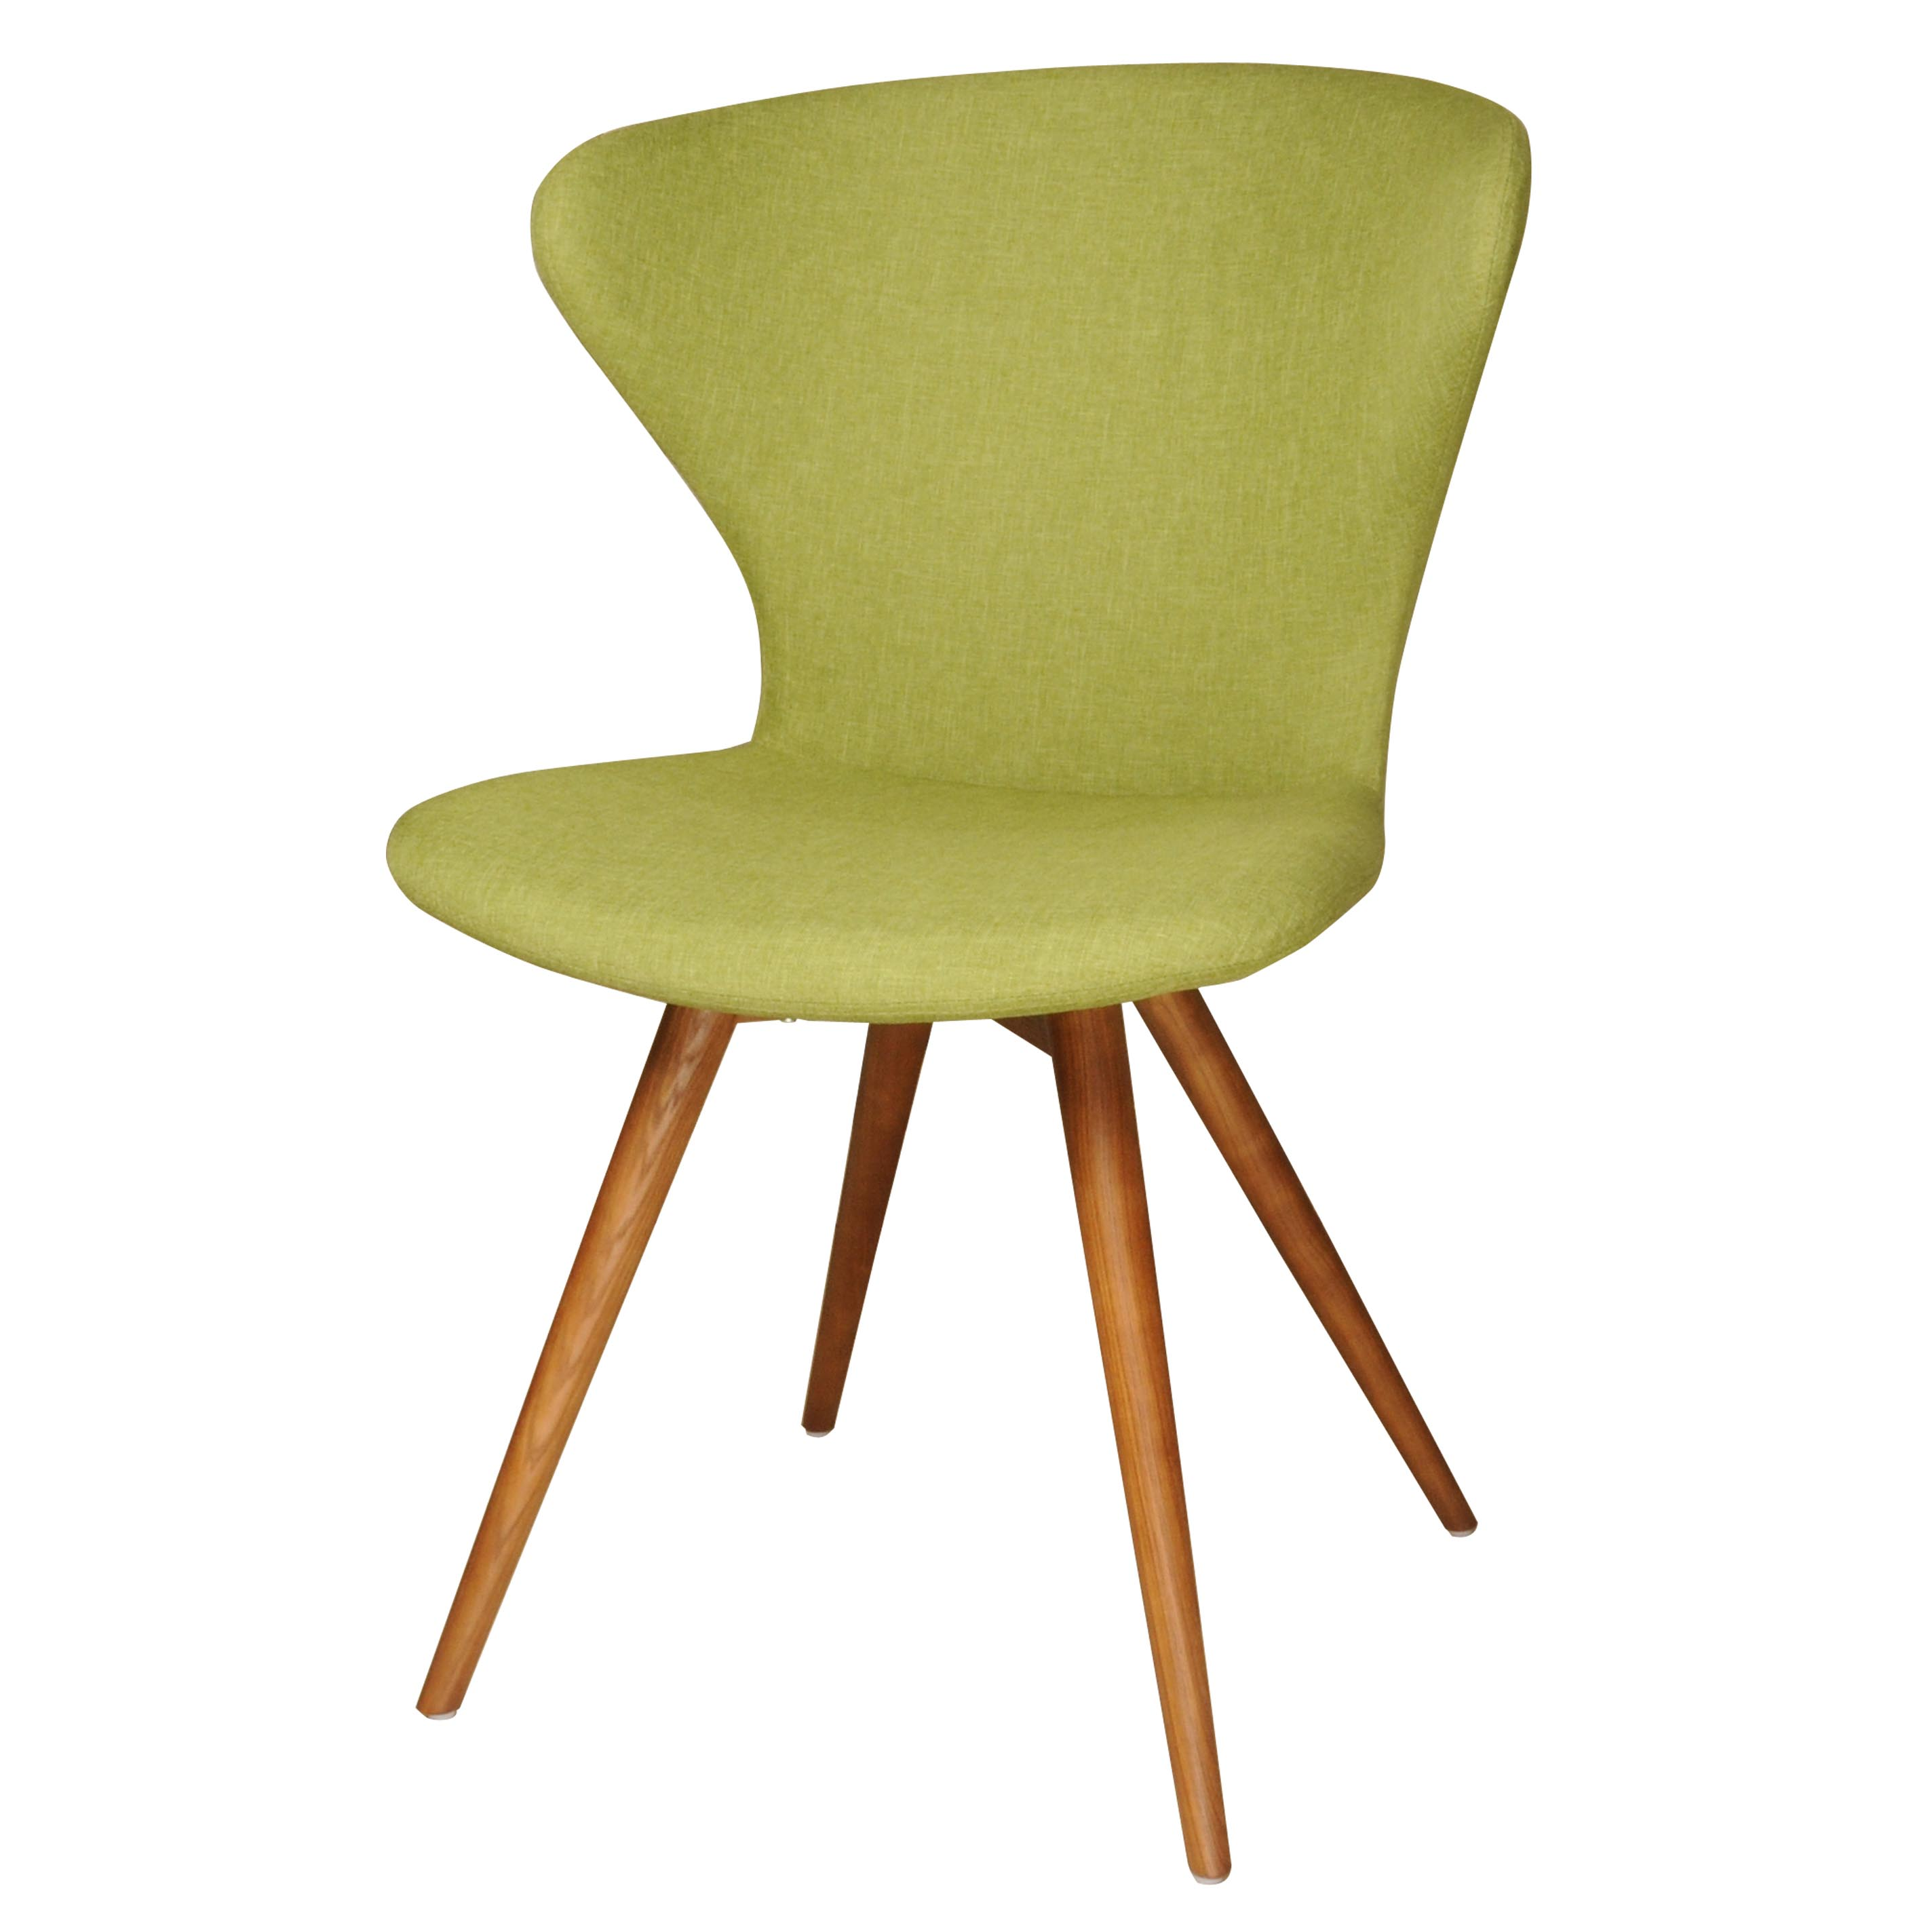 Brianda Kd Fabric Chair Walnut Legs Limerick Boulevard